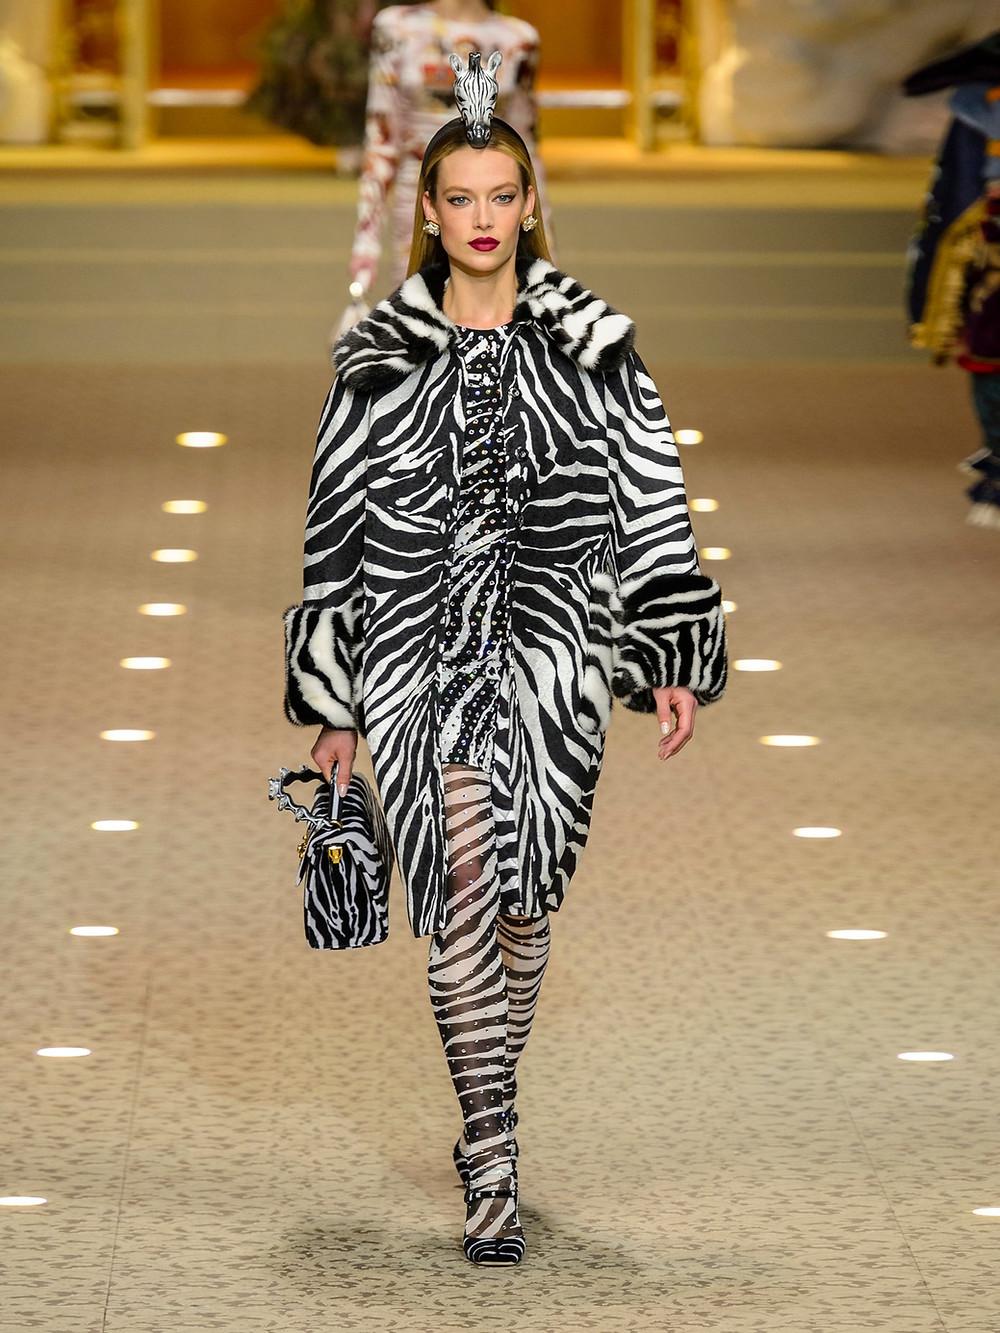 Dolce & Gabbana Zebra-print crystal-embellished mini dress $10,500